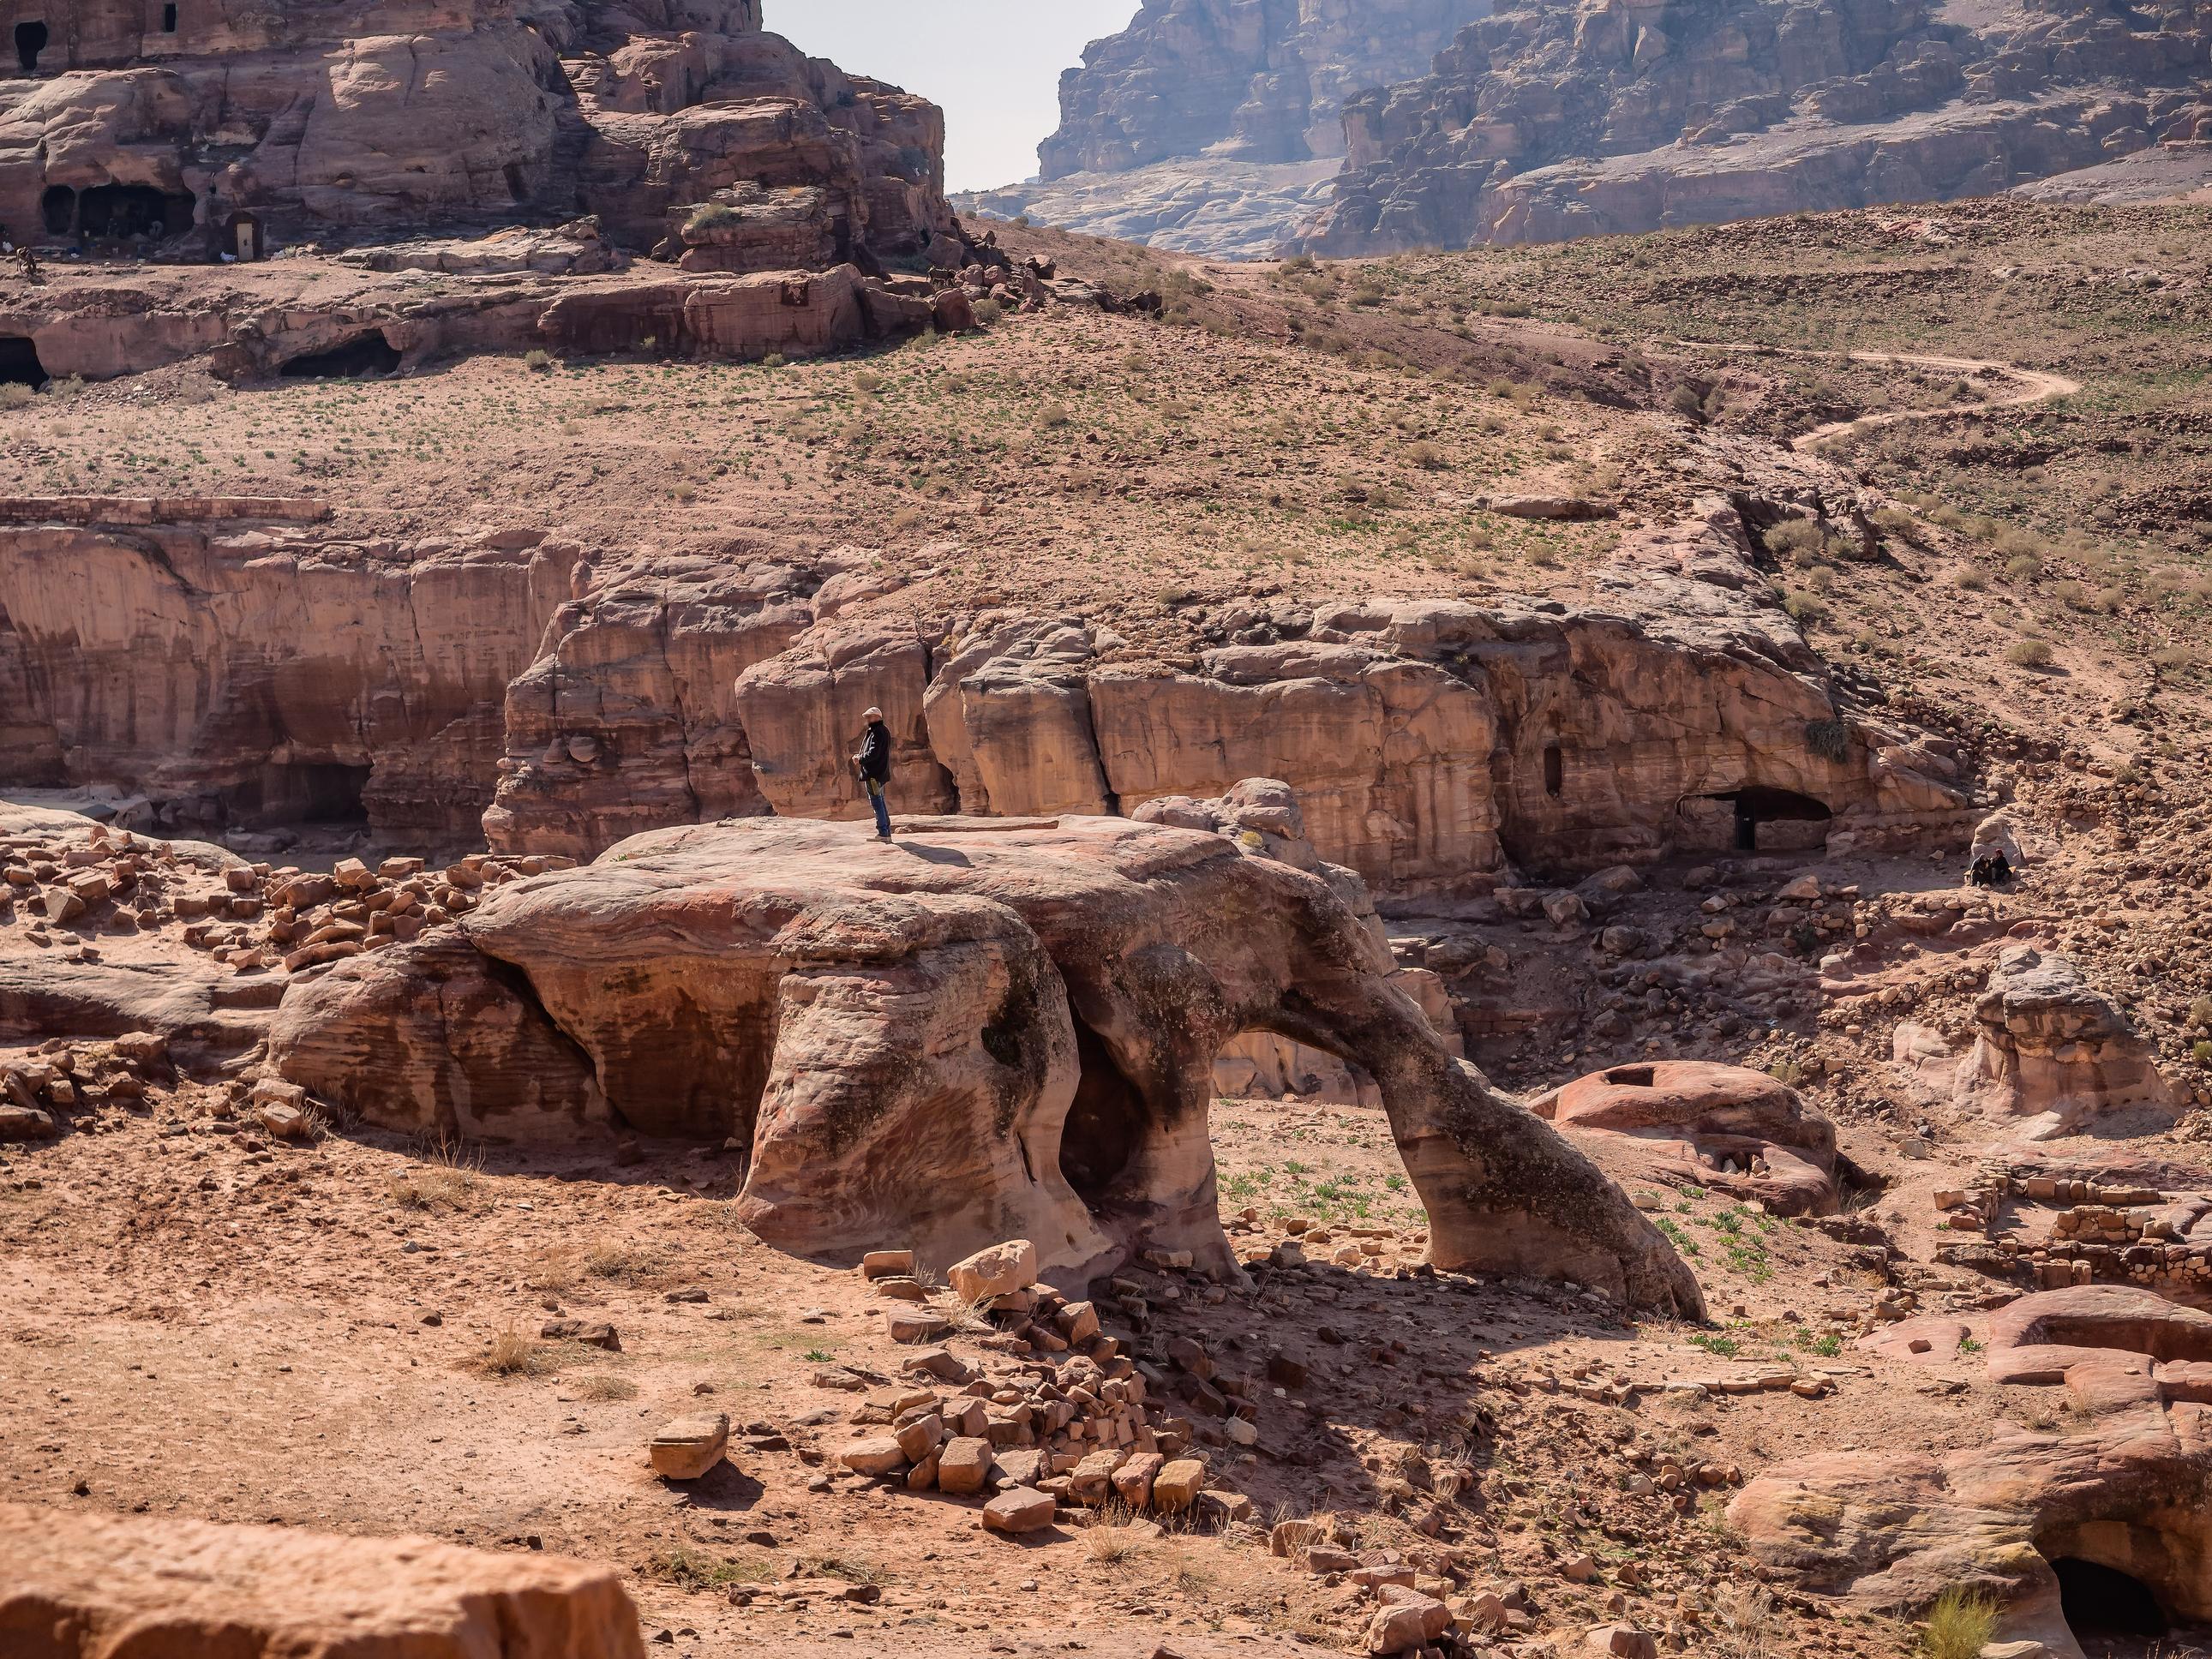 Explore the magical lost city of Petra